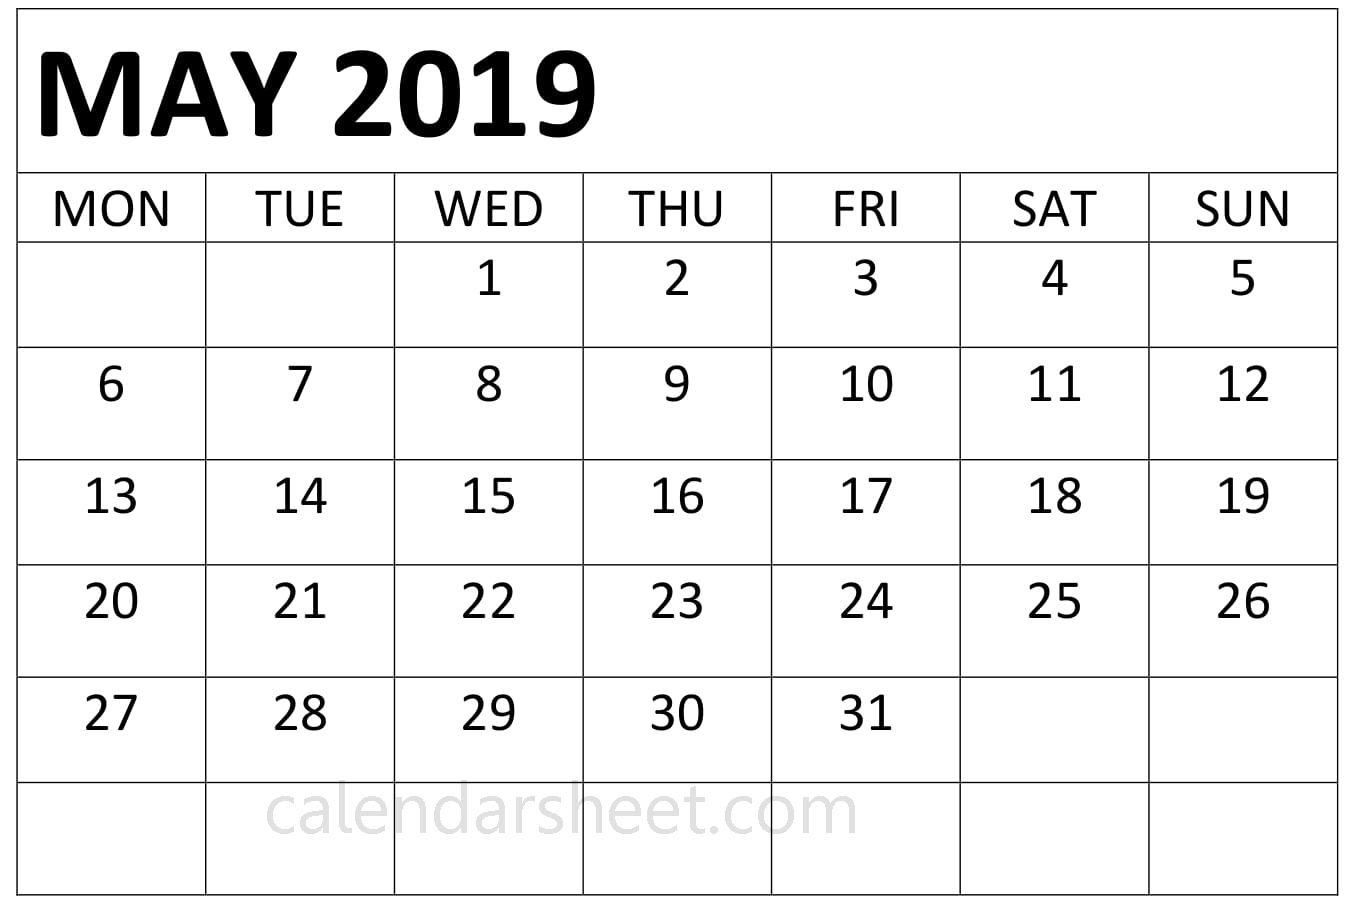 Free Editable May 2020 Calendar Printable Template With Holidays